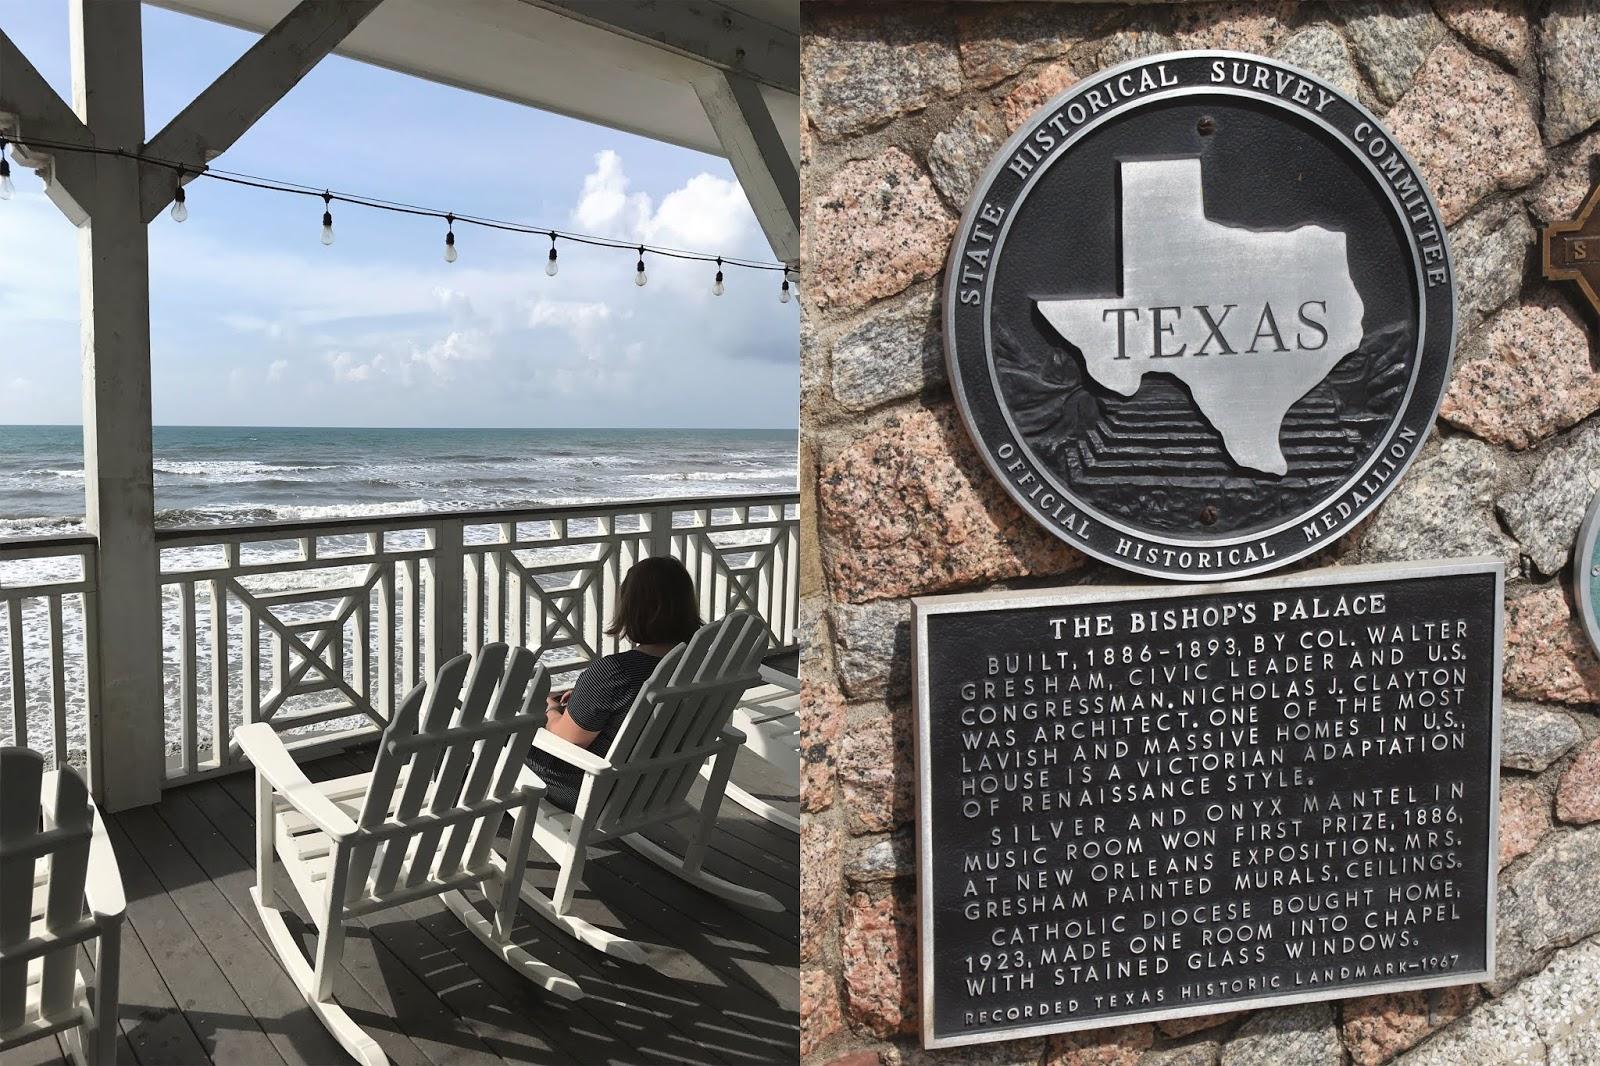 Bishops palace Galveston, Murdoch's Galveston, beach views Galveston, ocean in Galveston, rocking chair looking at beach